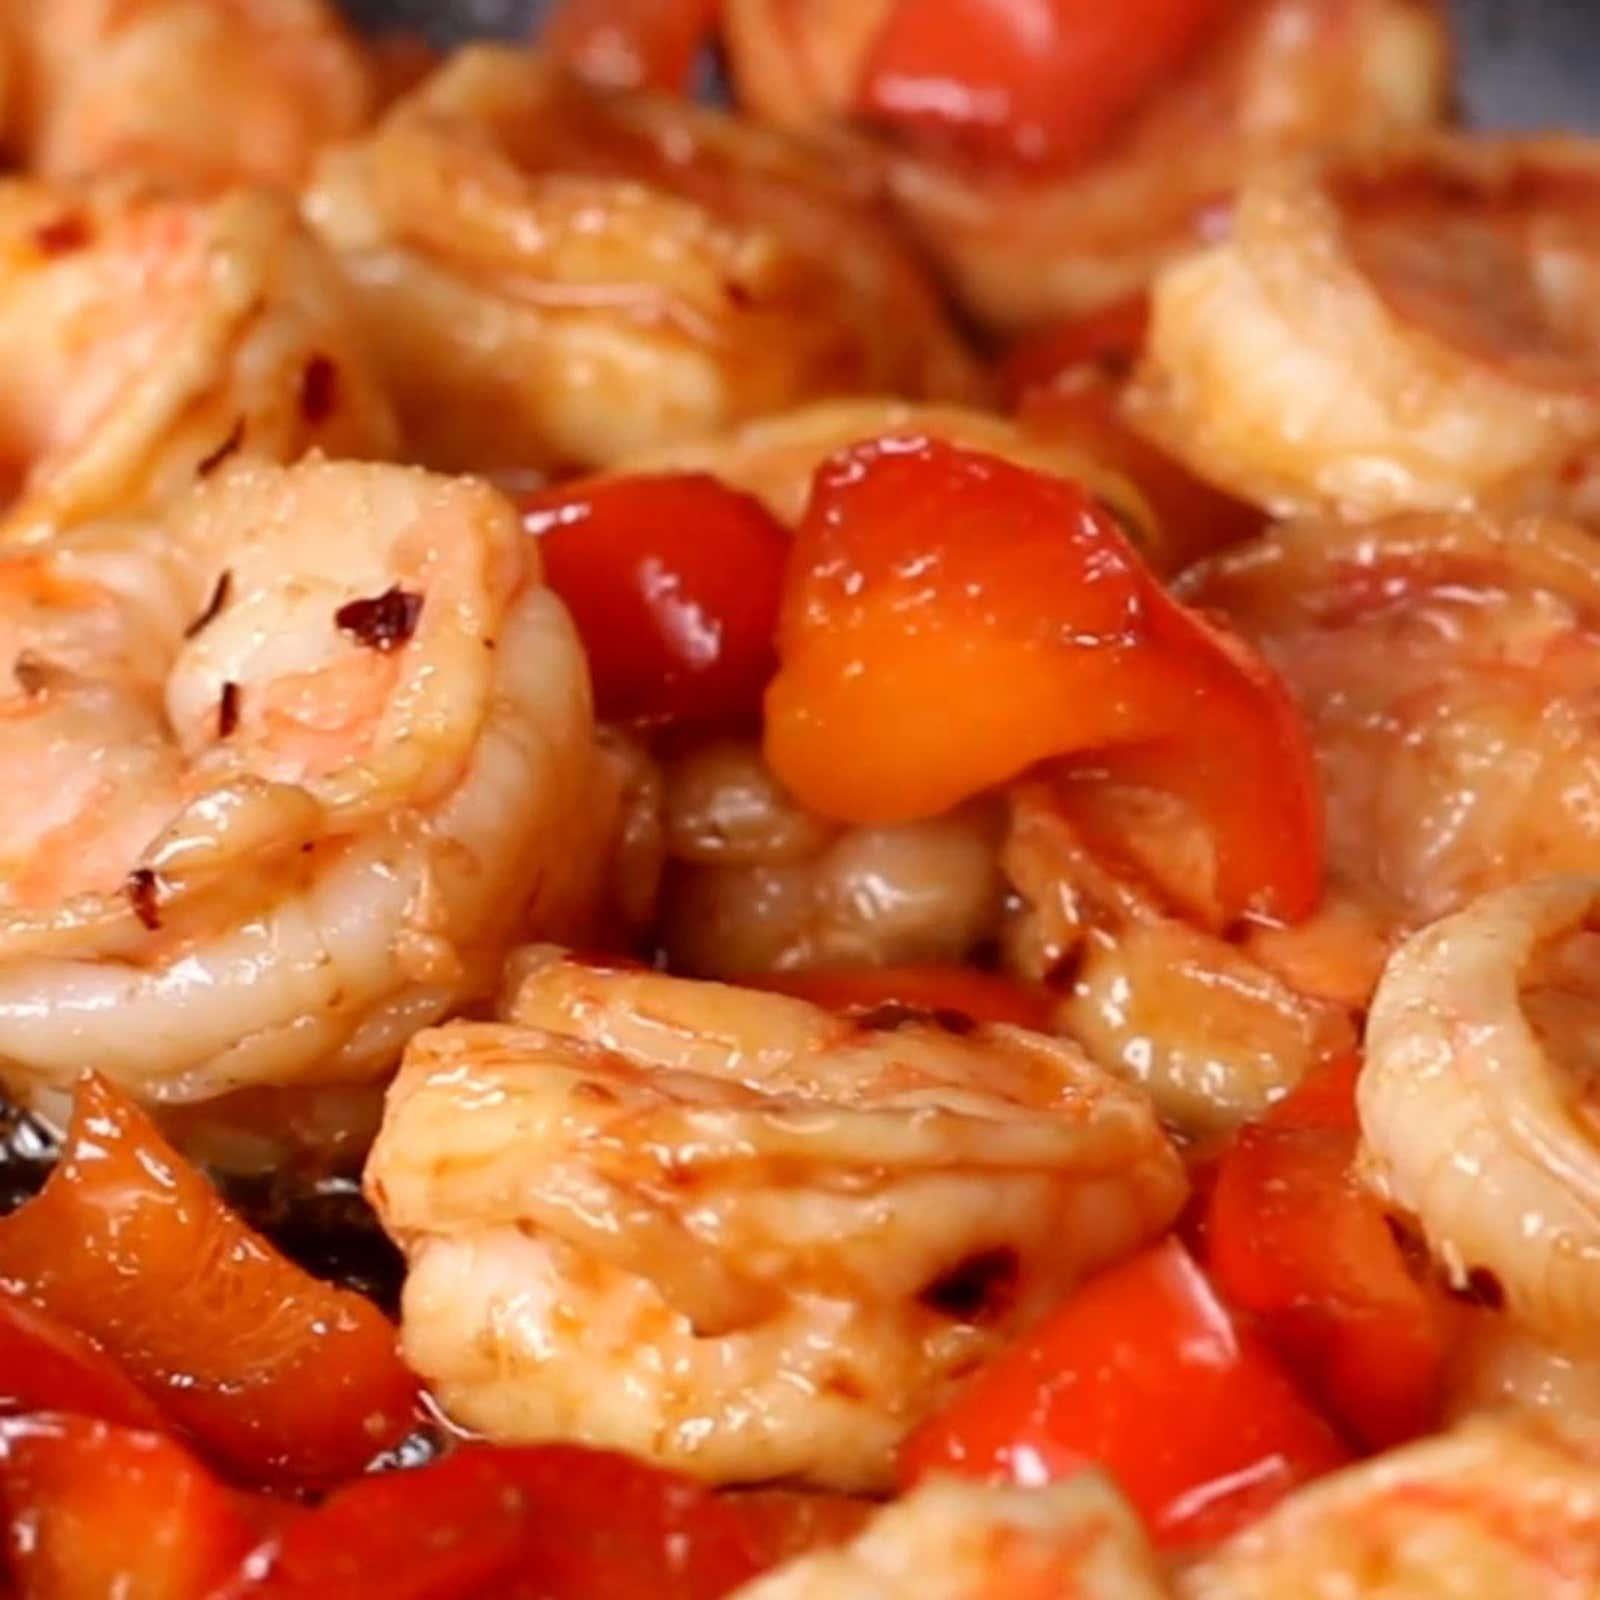 Red Chili Shrimp Stir-fry